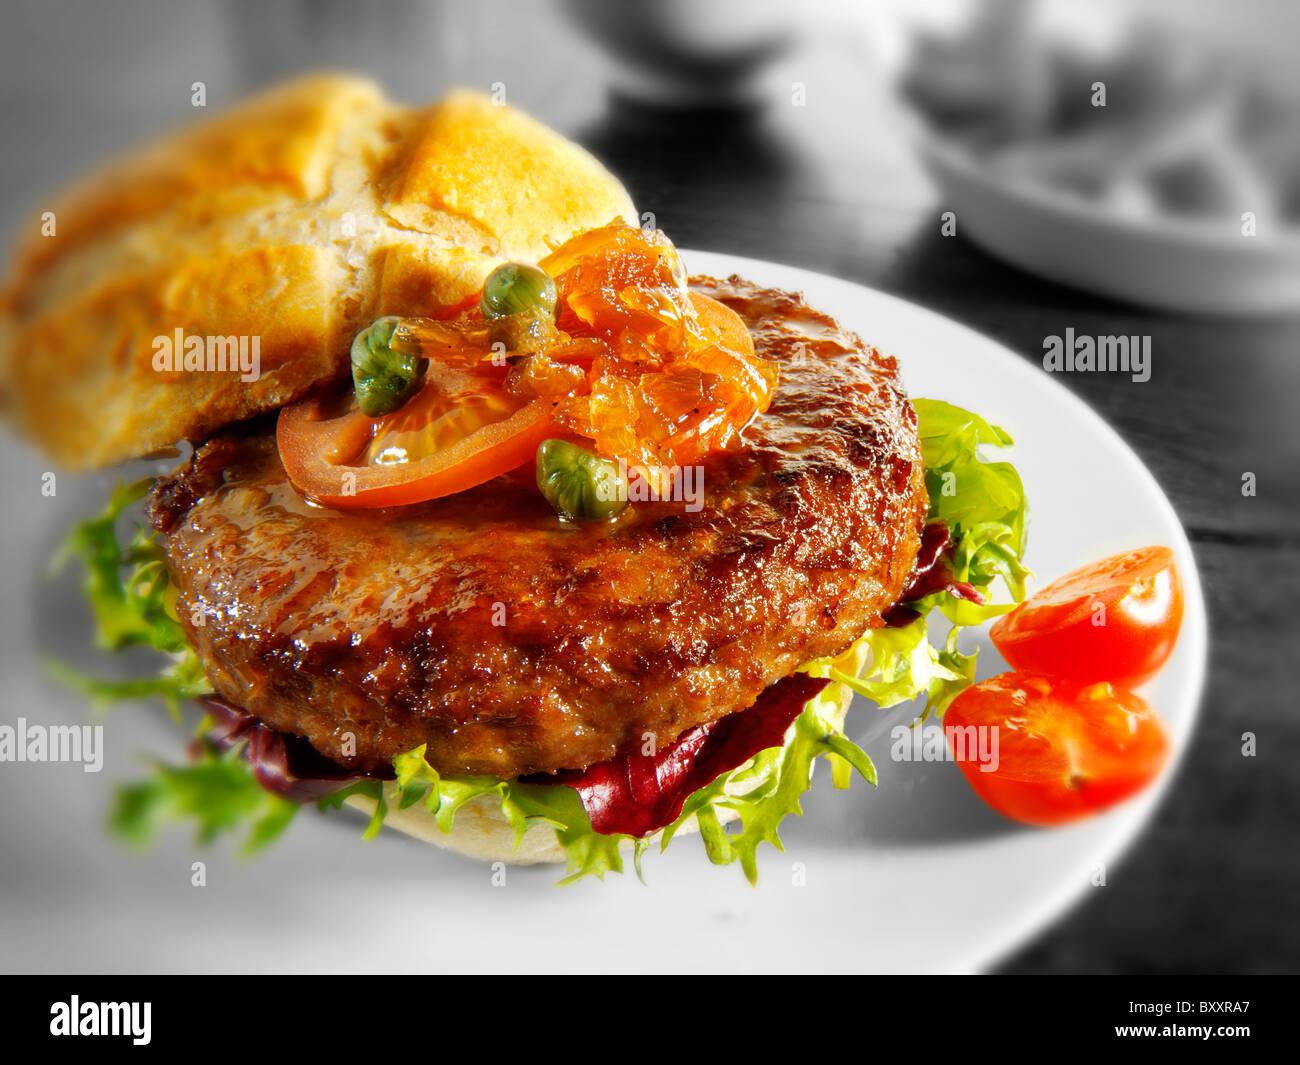 Hamburger with bub and relish - Stock Image